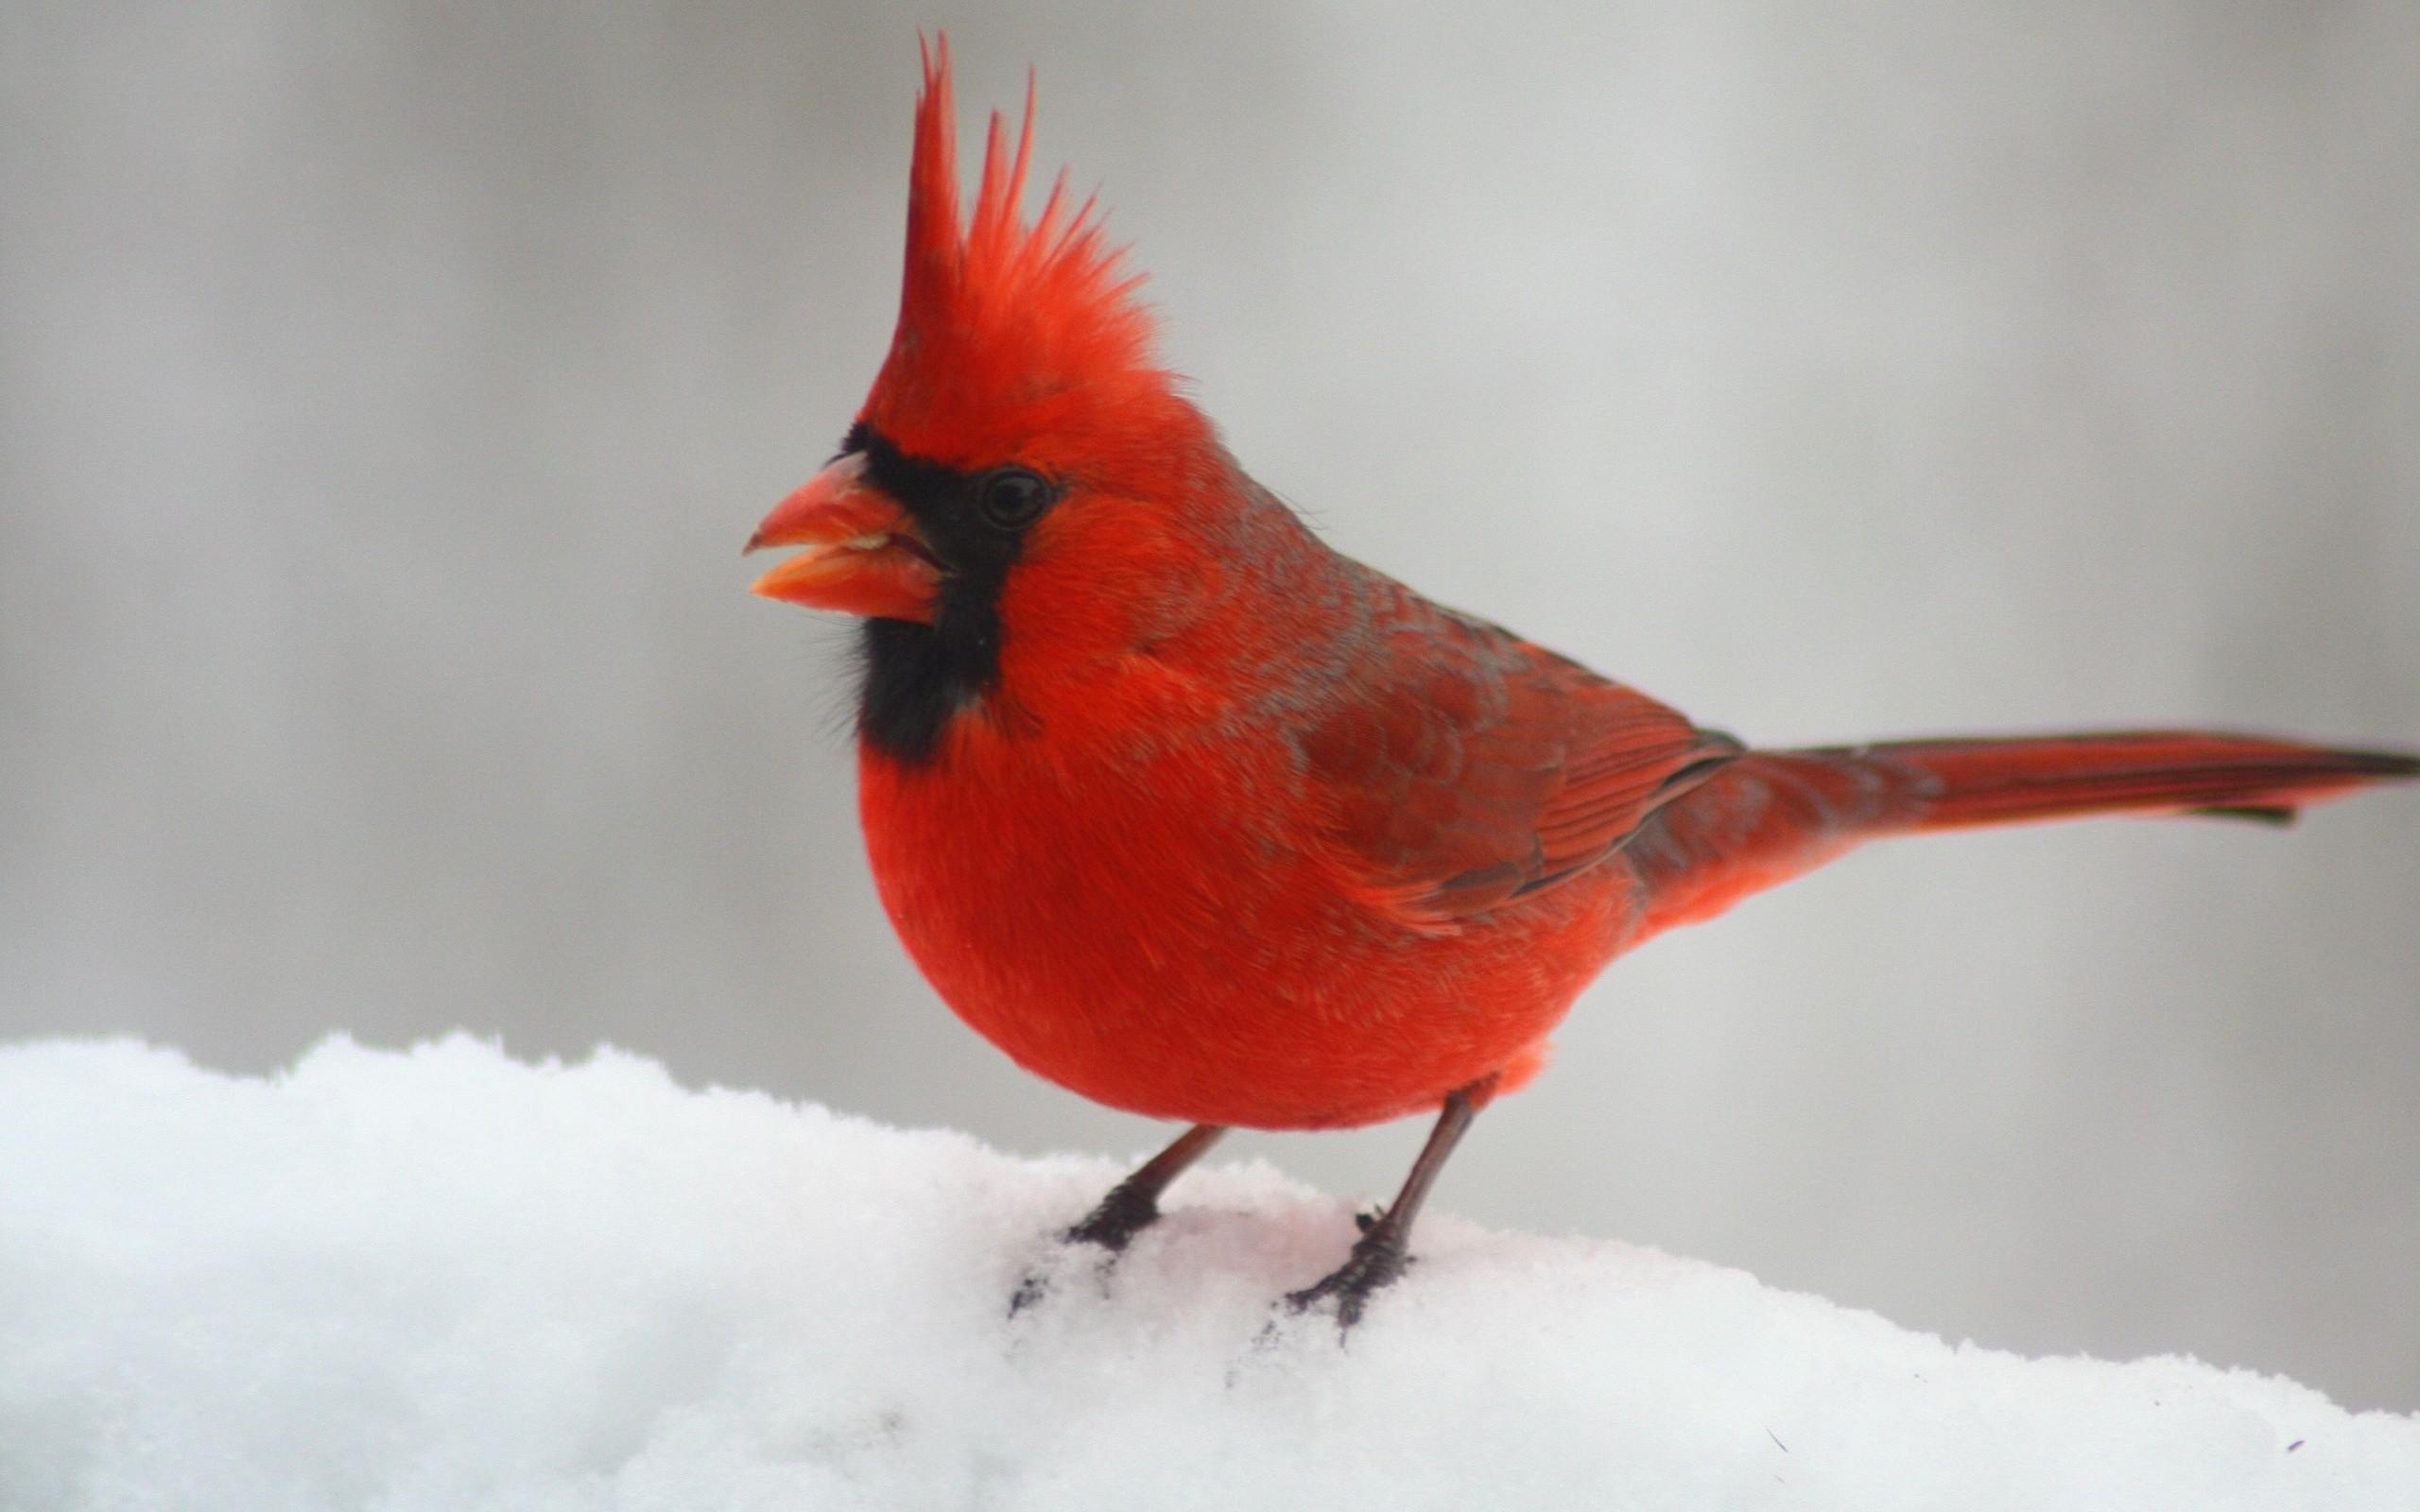 Res: 2560x1600, Birds, Northern Cardinal, Winter, Red Bird, Northern Cardinal Red Bird